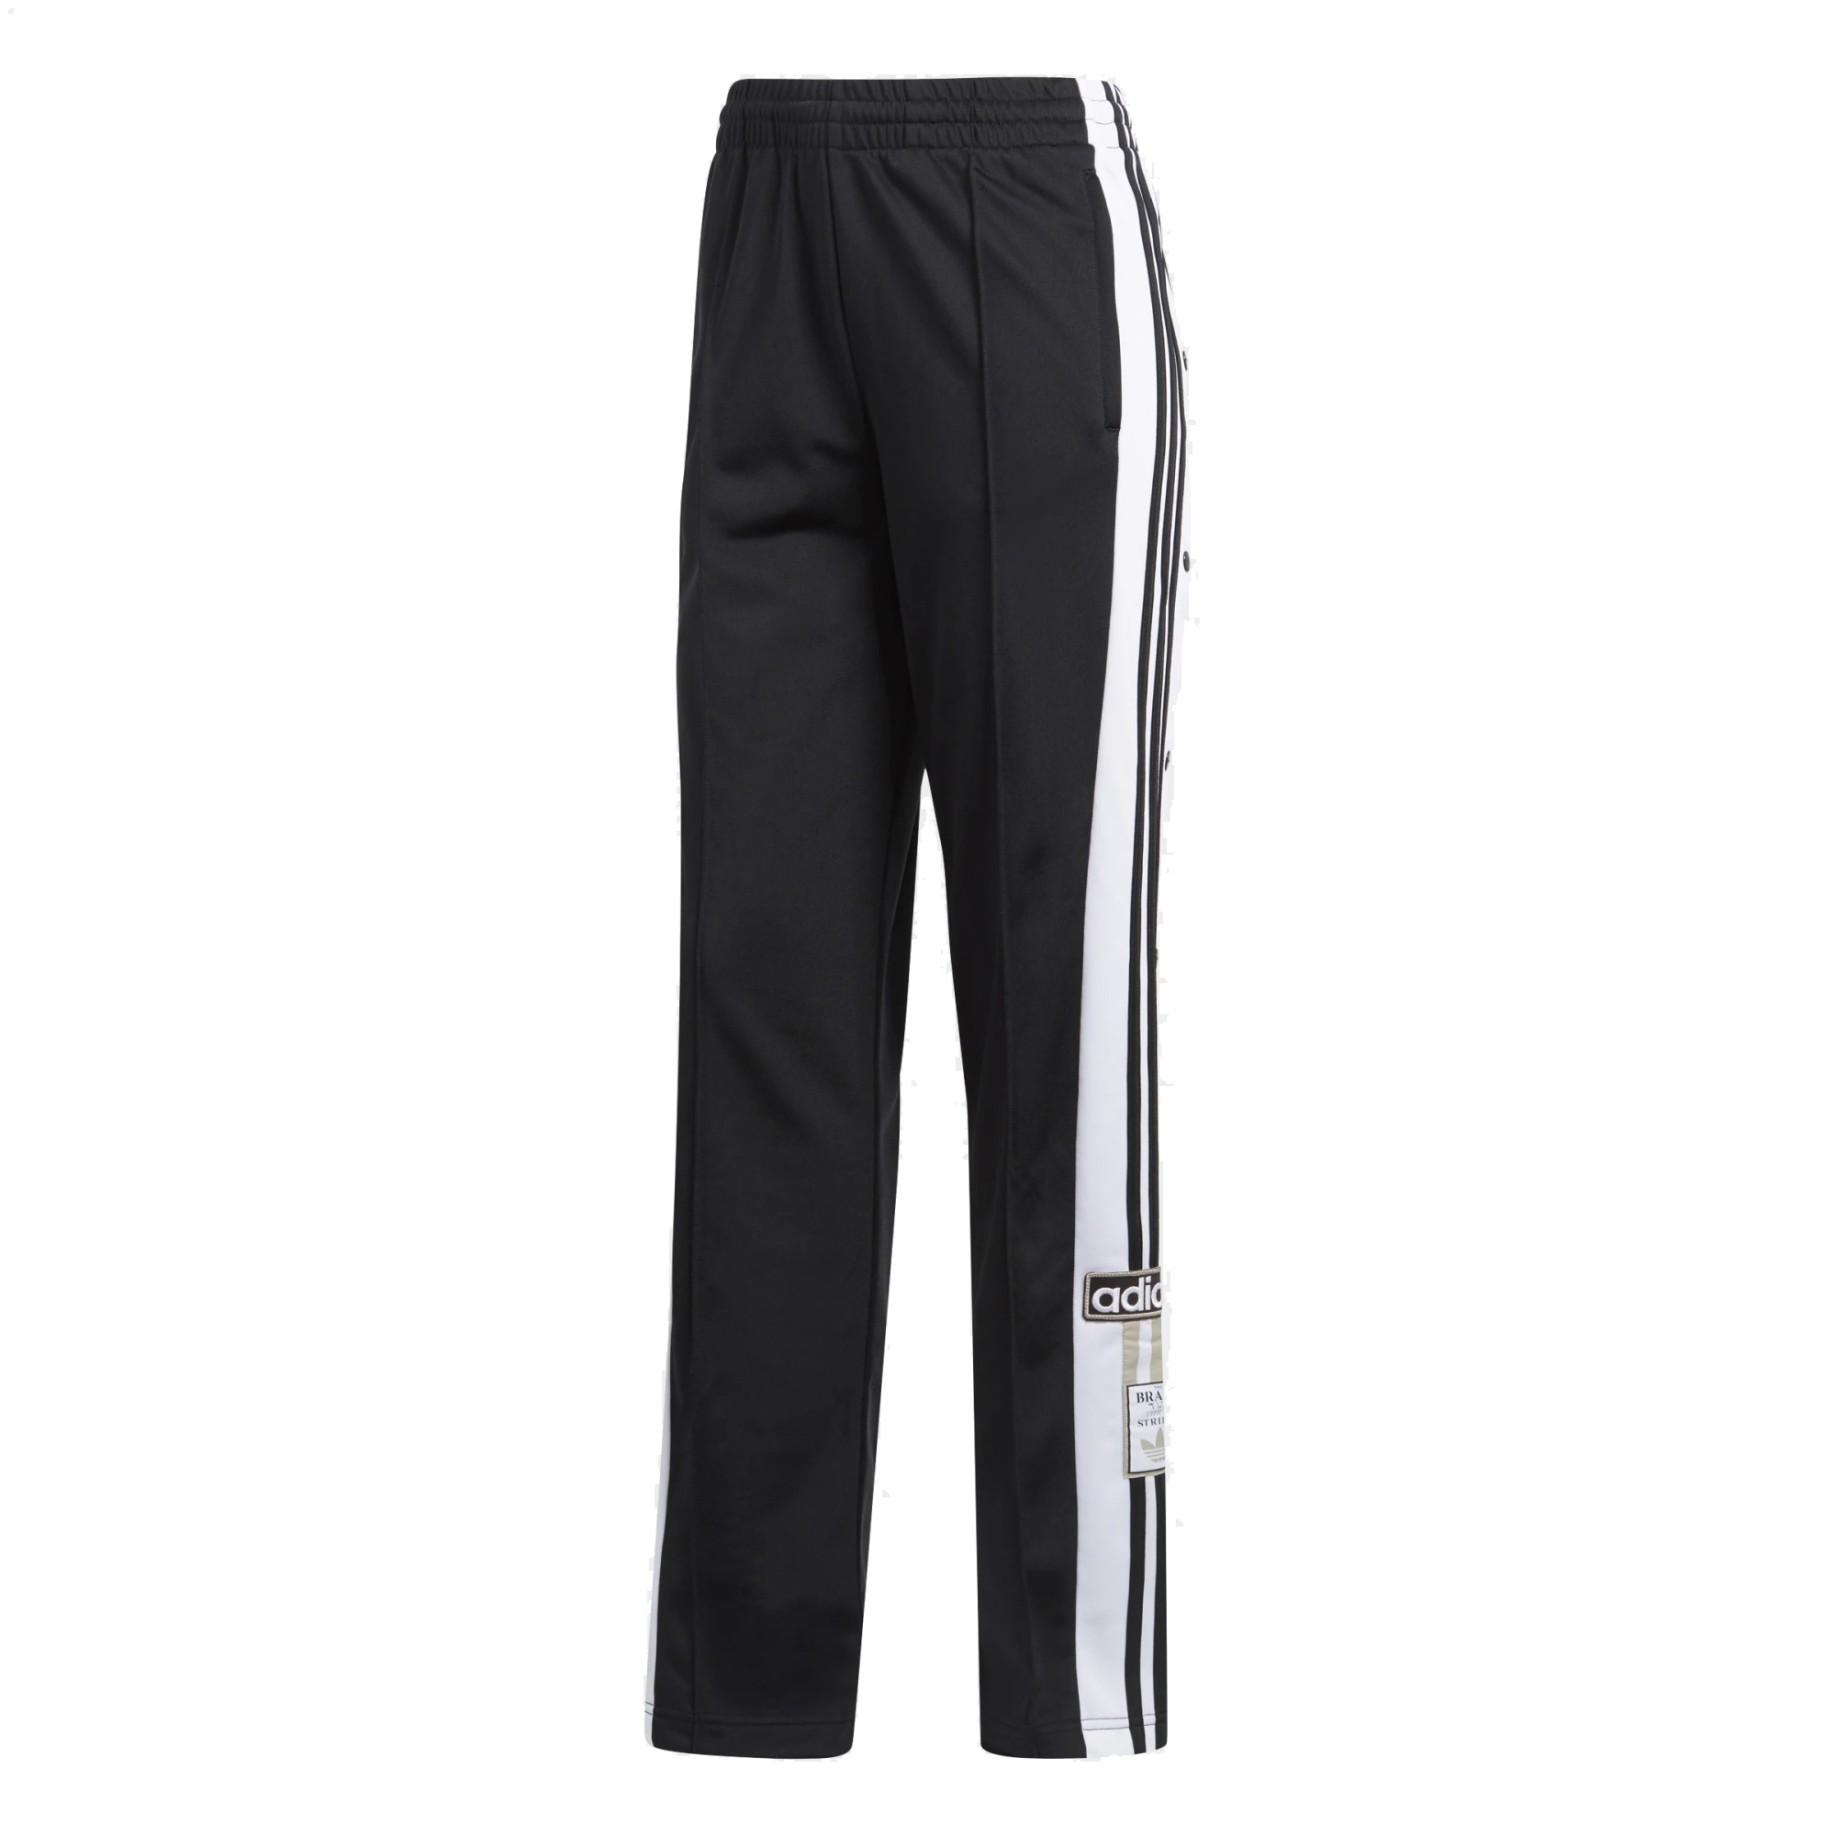 169d79b7e4d2 Women's Pants Track Pants Adibreak colore Black White - Adidas Originals -  SportIT.com